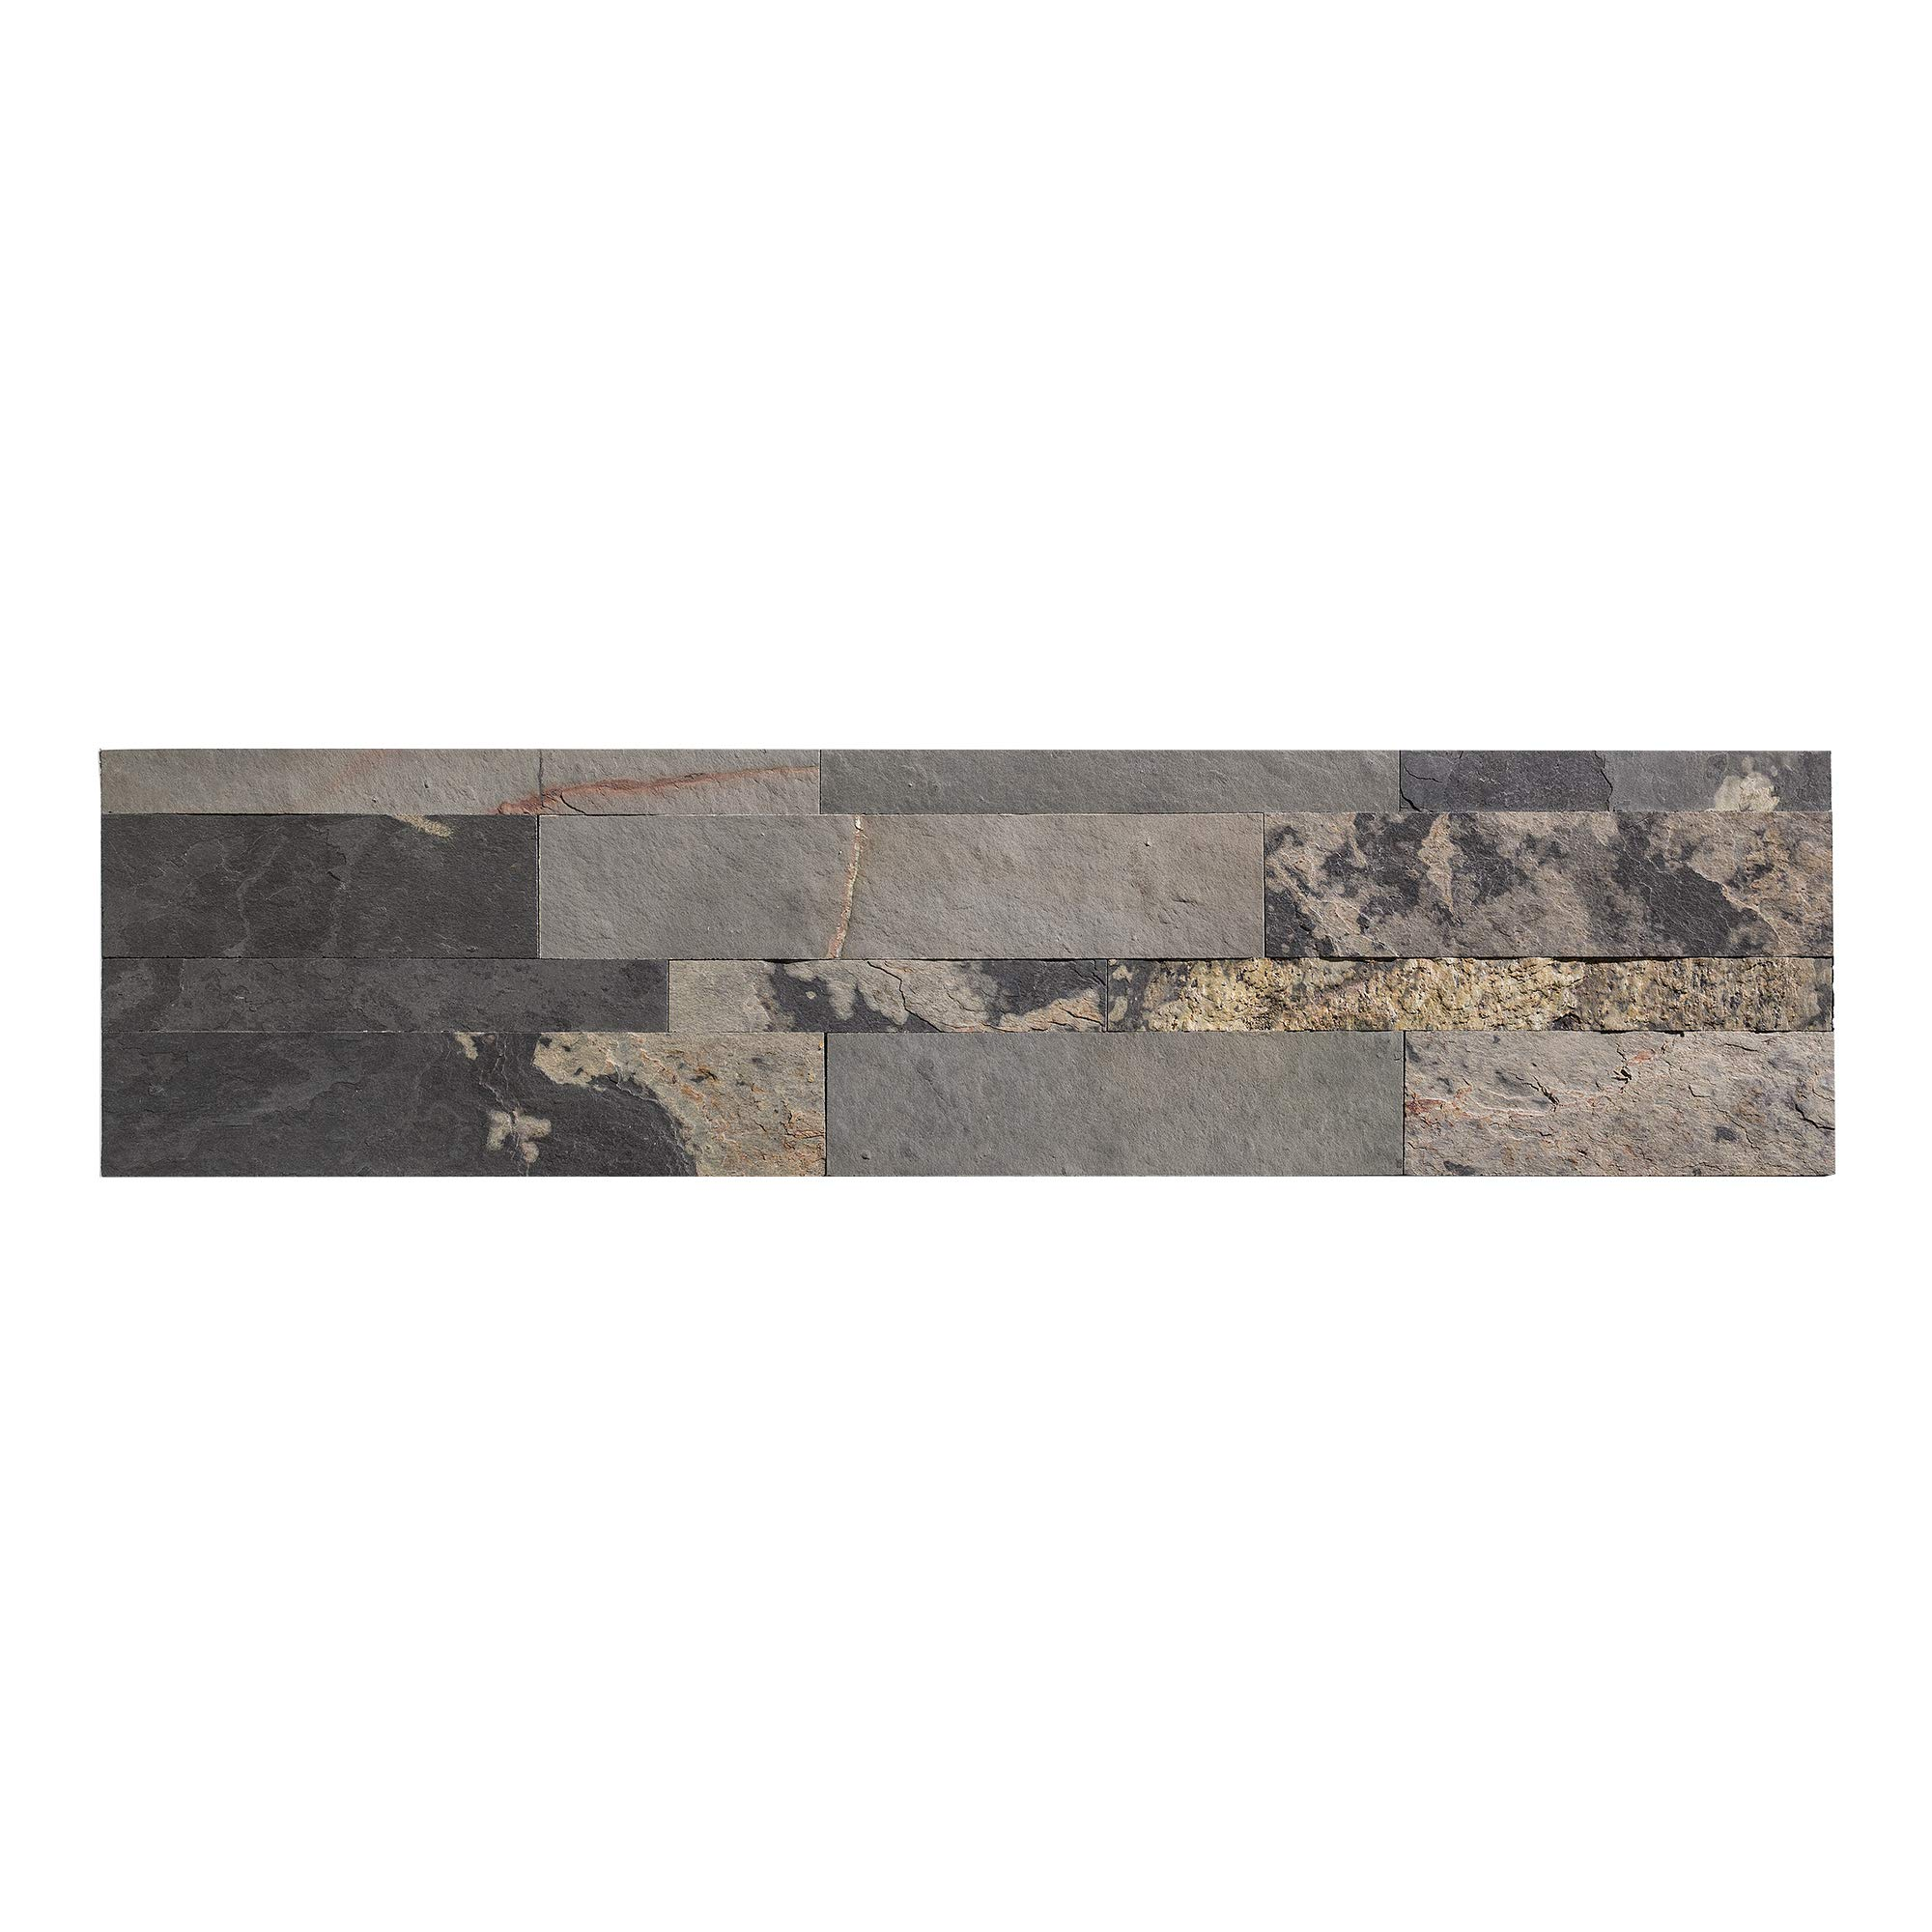 Aspect Peel and Stick Stone Overlay Kitchen Backsplash - Medley Slate (5.9'' x 23.6'' x 1/8'' Panel - Approx. 1 sq ft) - Easy DIY Tile Backsplash